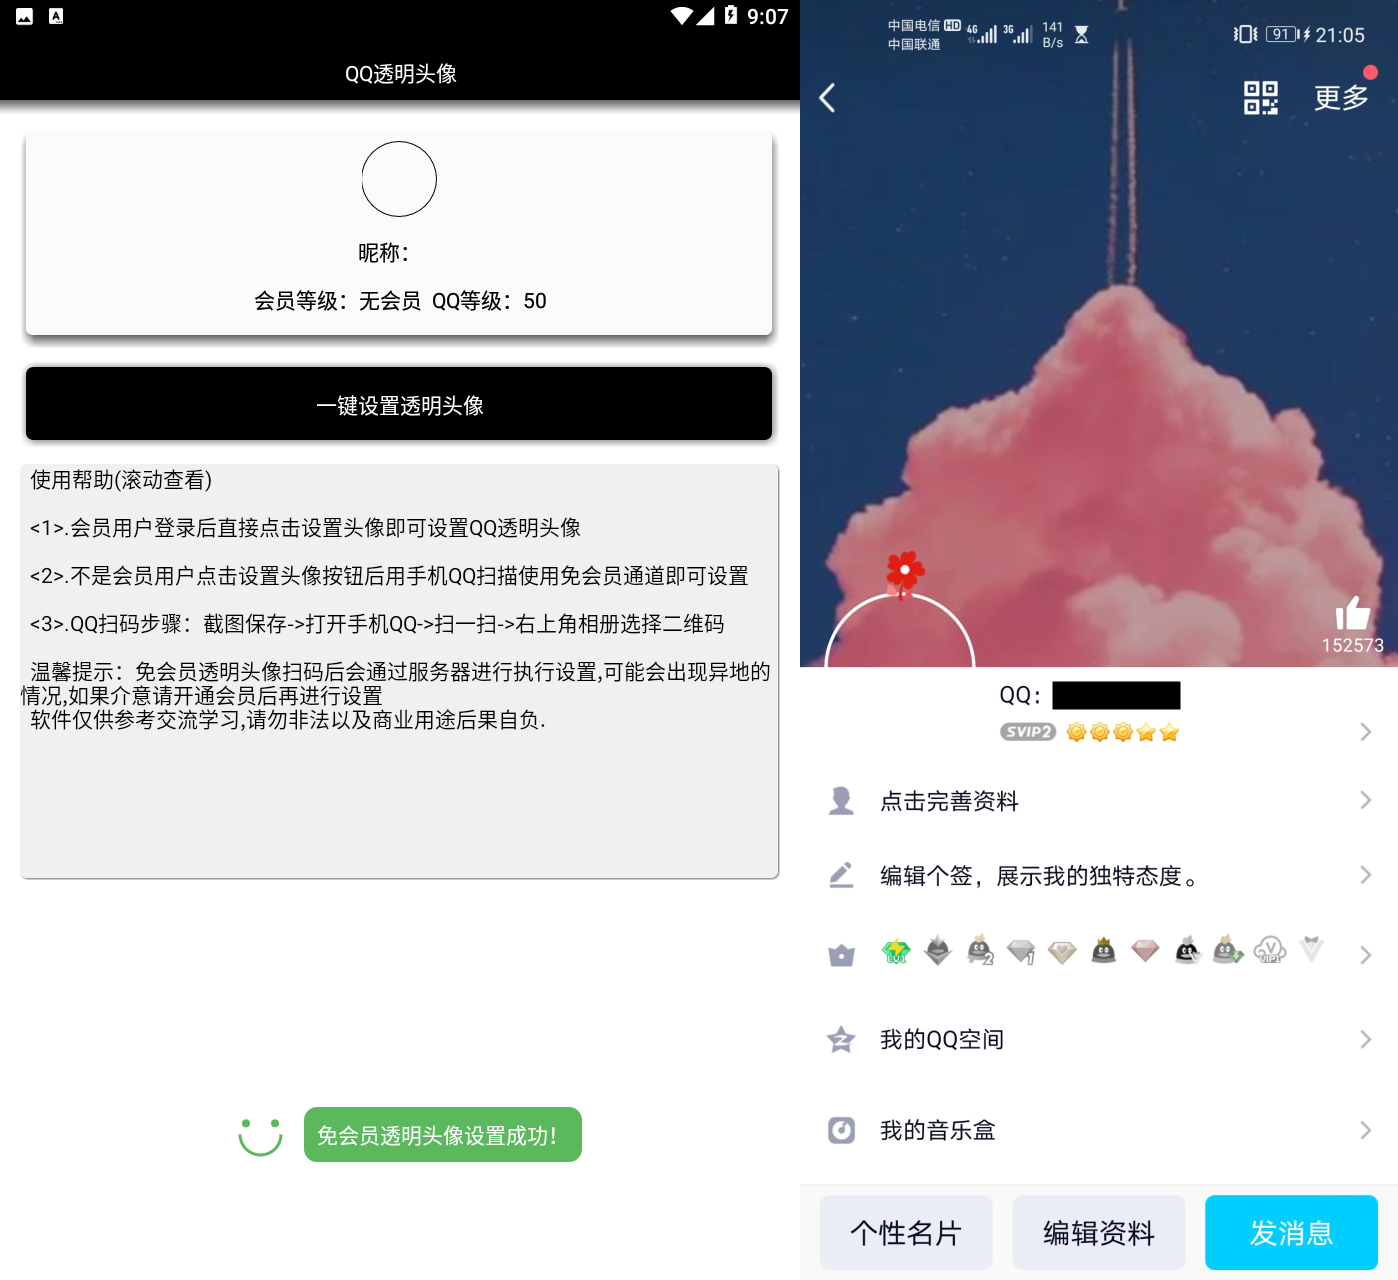 QQ空白资料最新可用版 一键清空资料